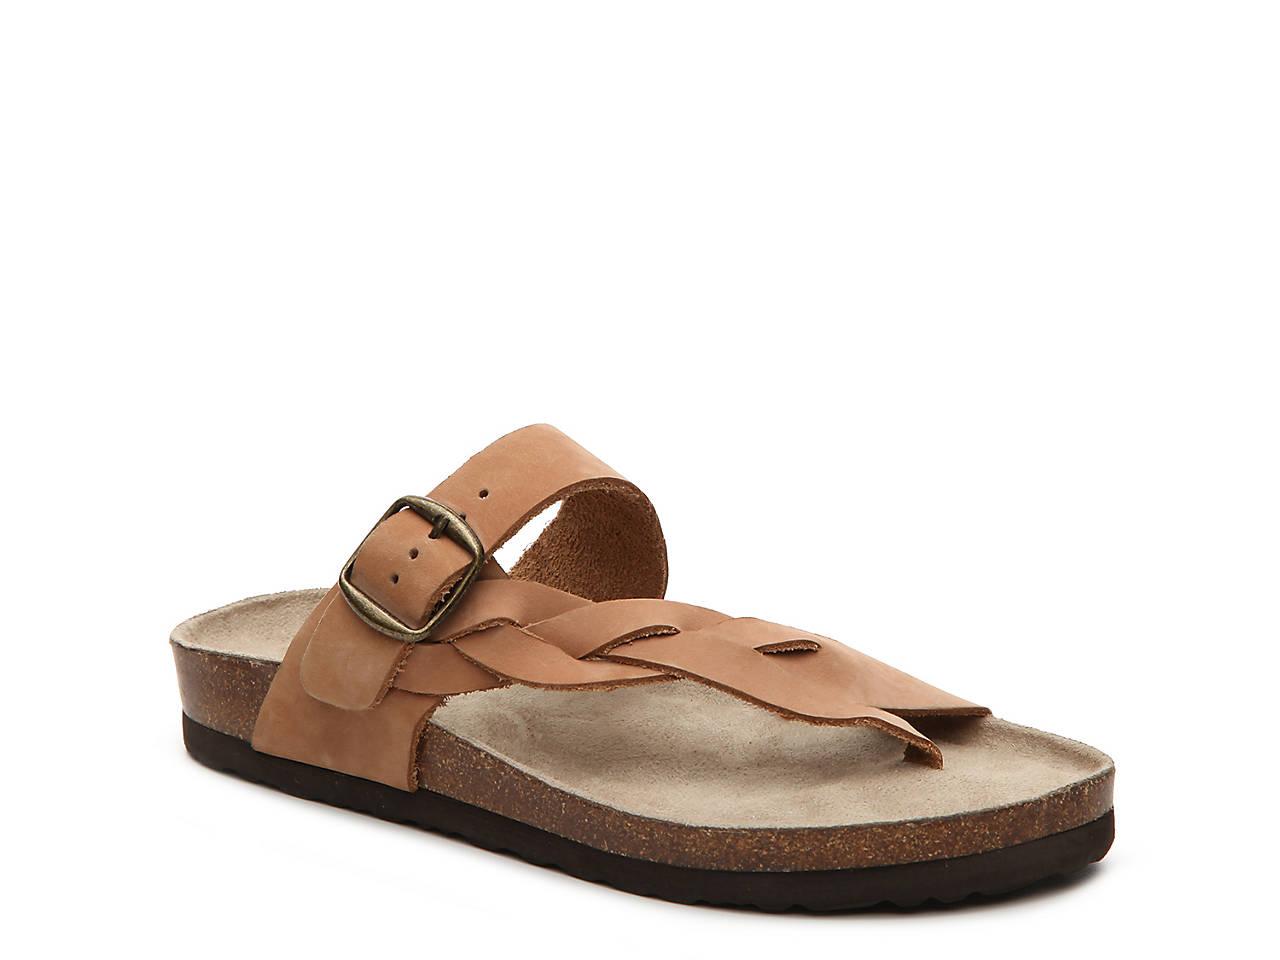 Crawford Flat Sandal